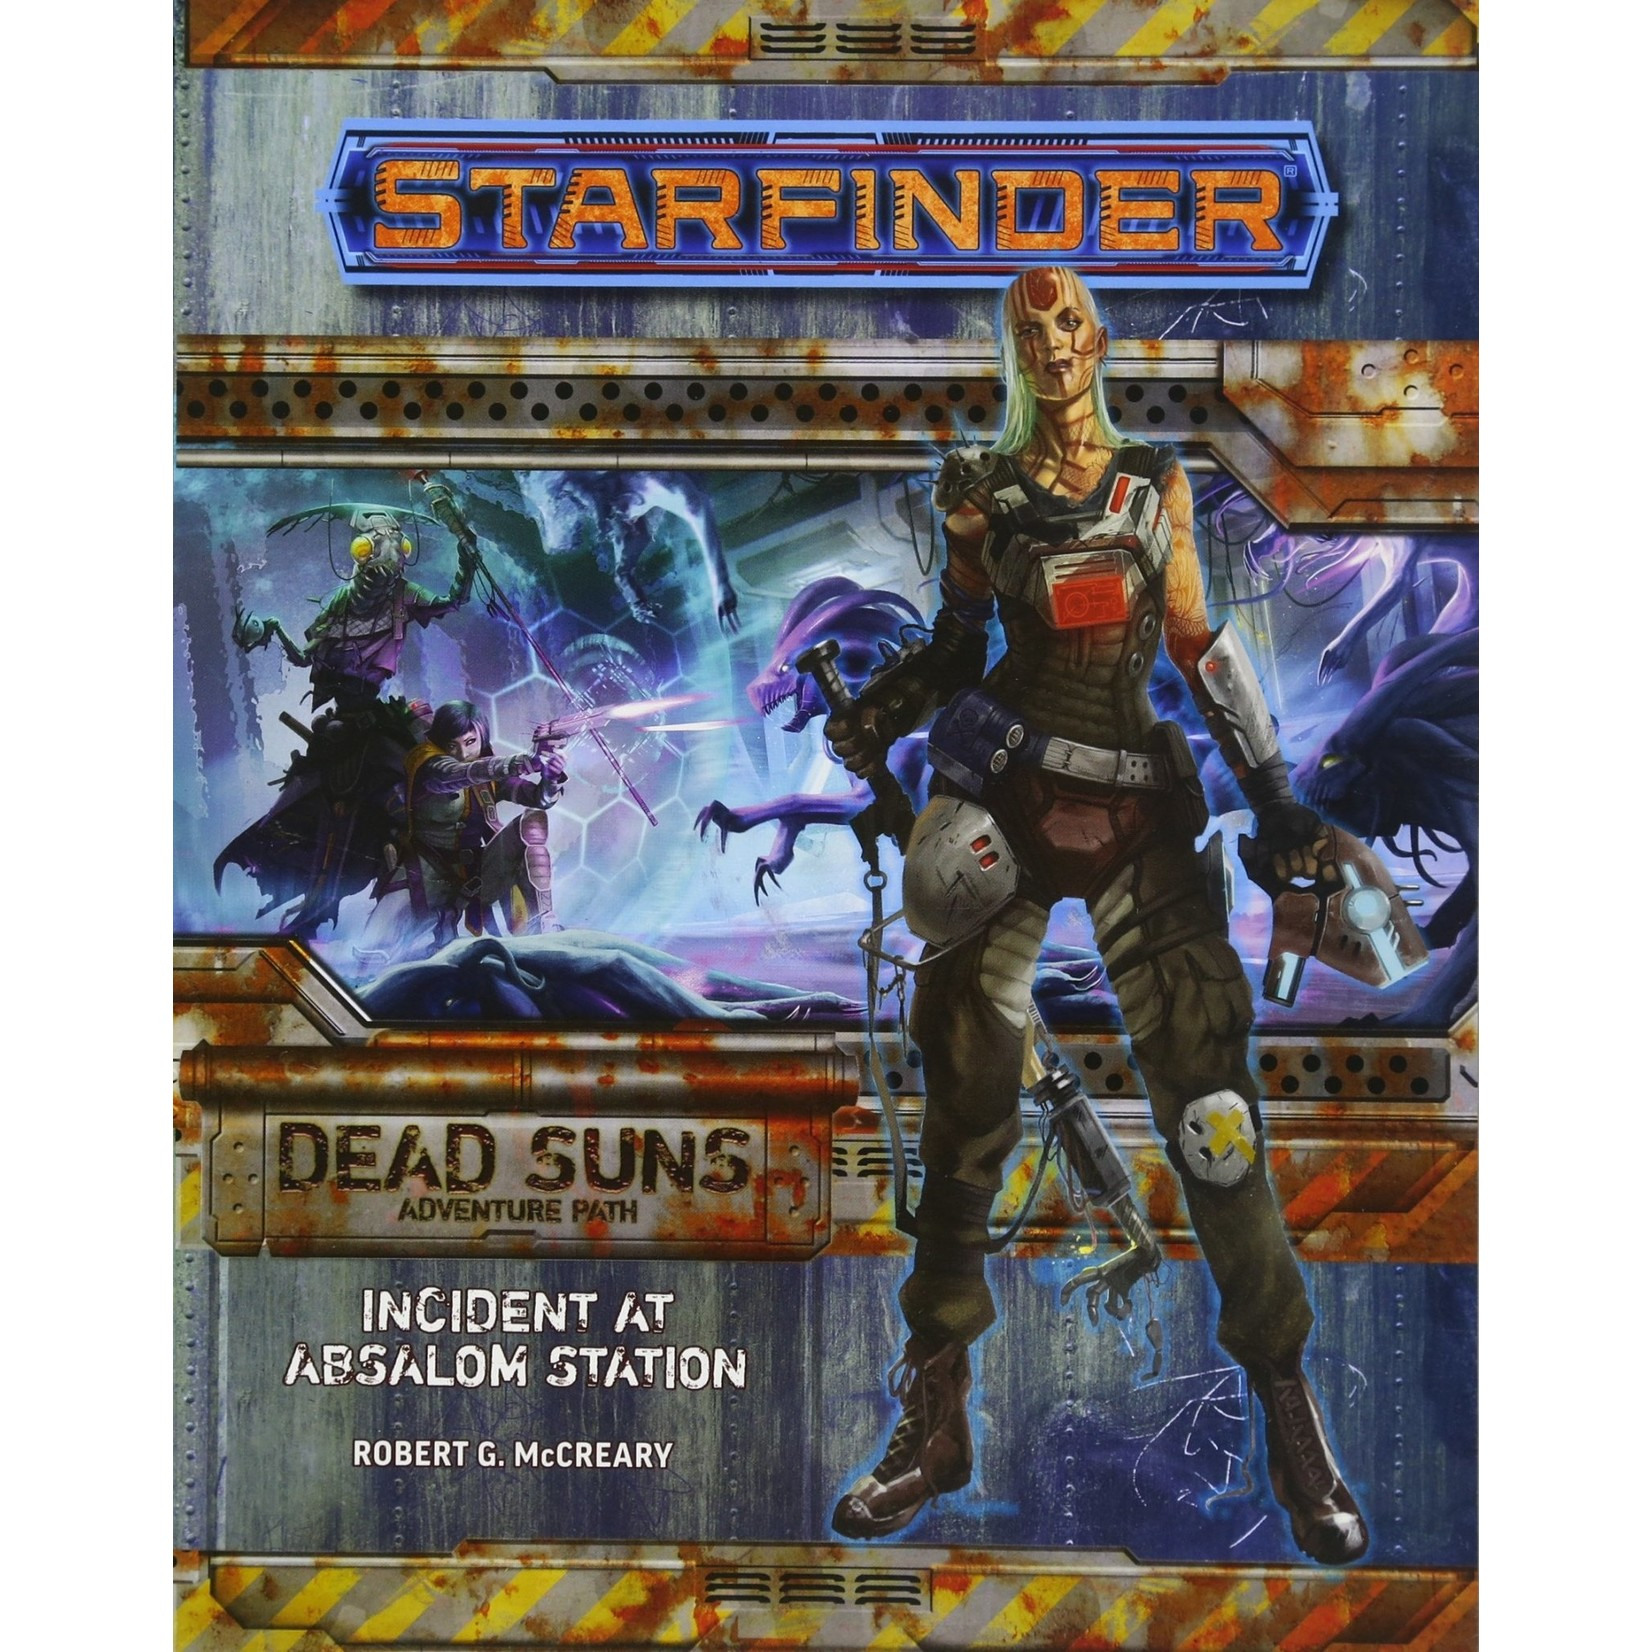 Starfinder RPG Adventure Path: Dead Suns 1 Incident at Absalom Station